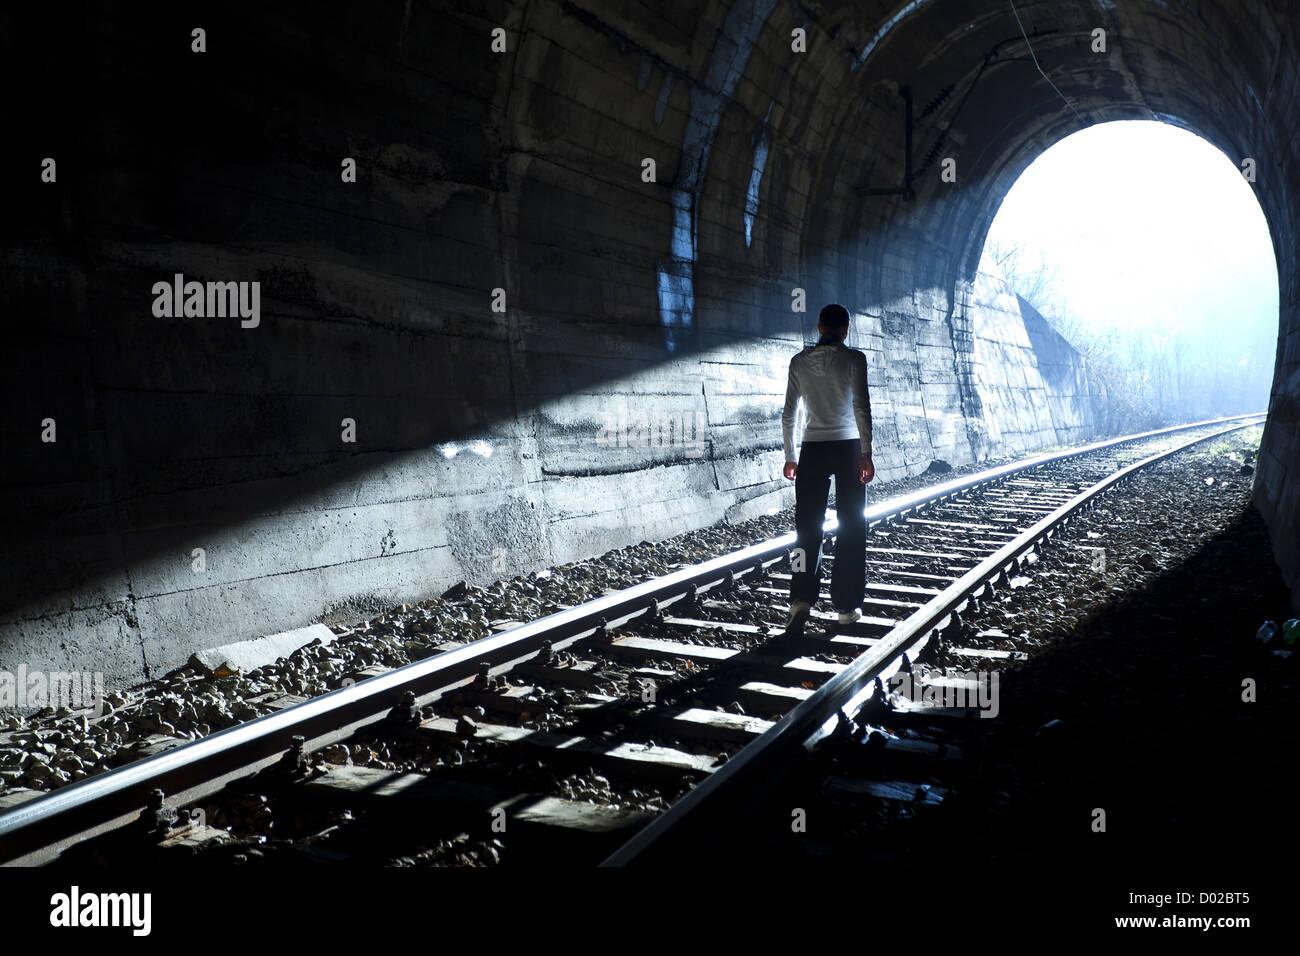 Ausfahrt aus dunkel - Licht am Ende des Tunnels Stockbild